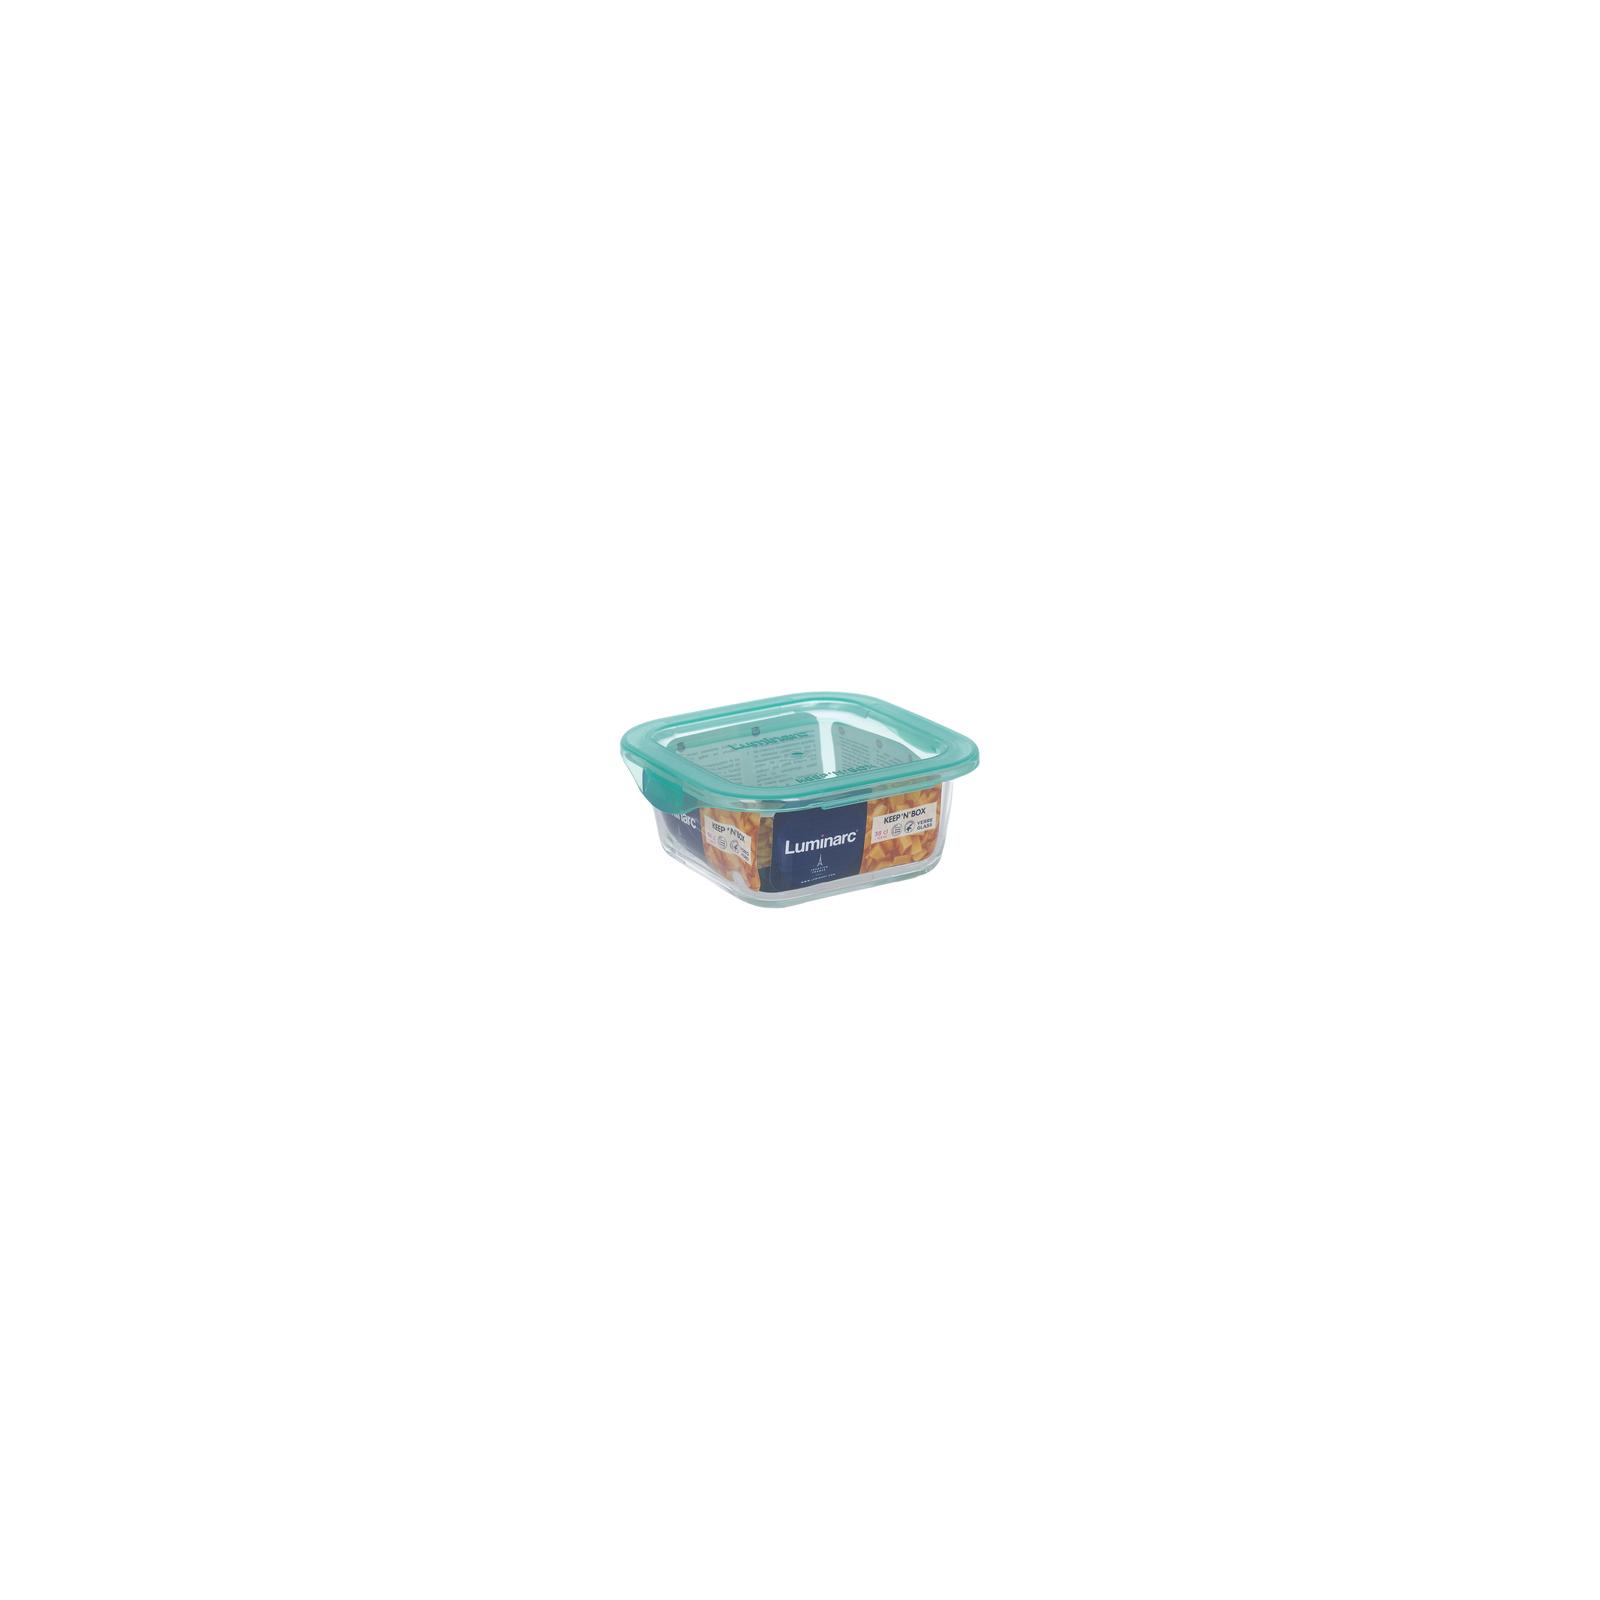 Пищевой контейнер Luminarc Keep'n Box Lagoon квадр. 380 мл (P5522) изображение 3